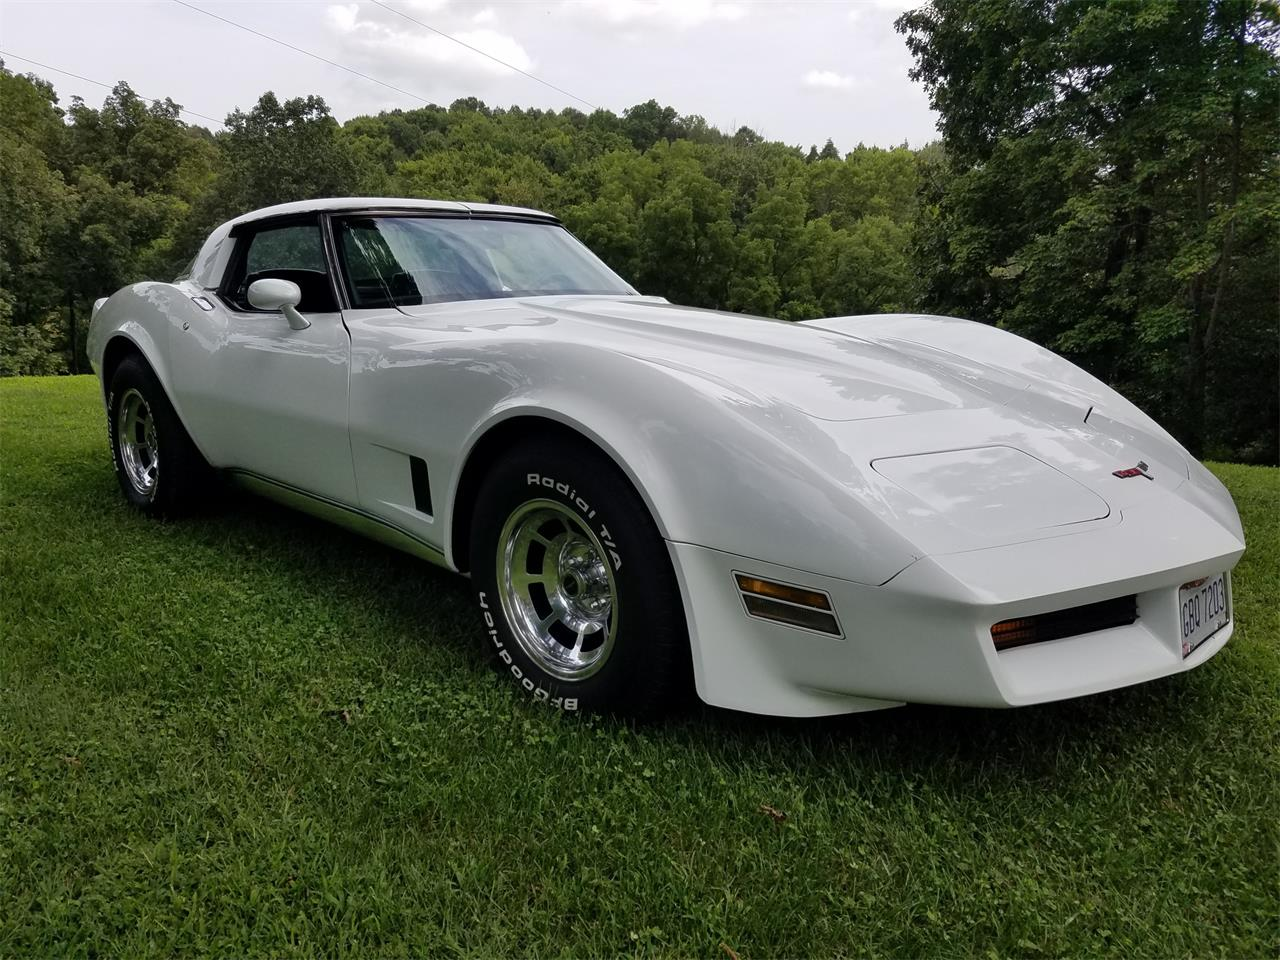 Kelebihan Corvette 1980 Top Model Tahun Ini